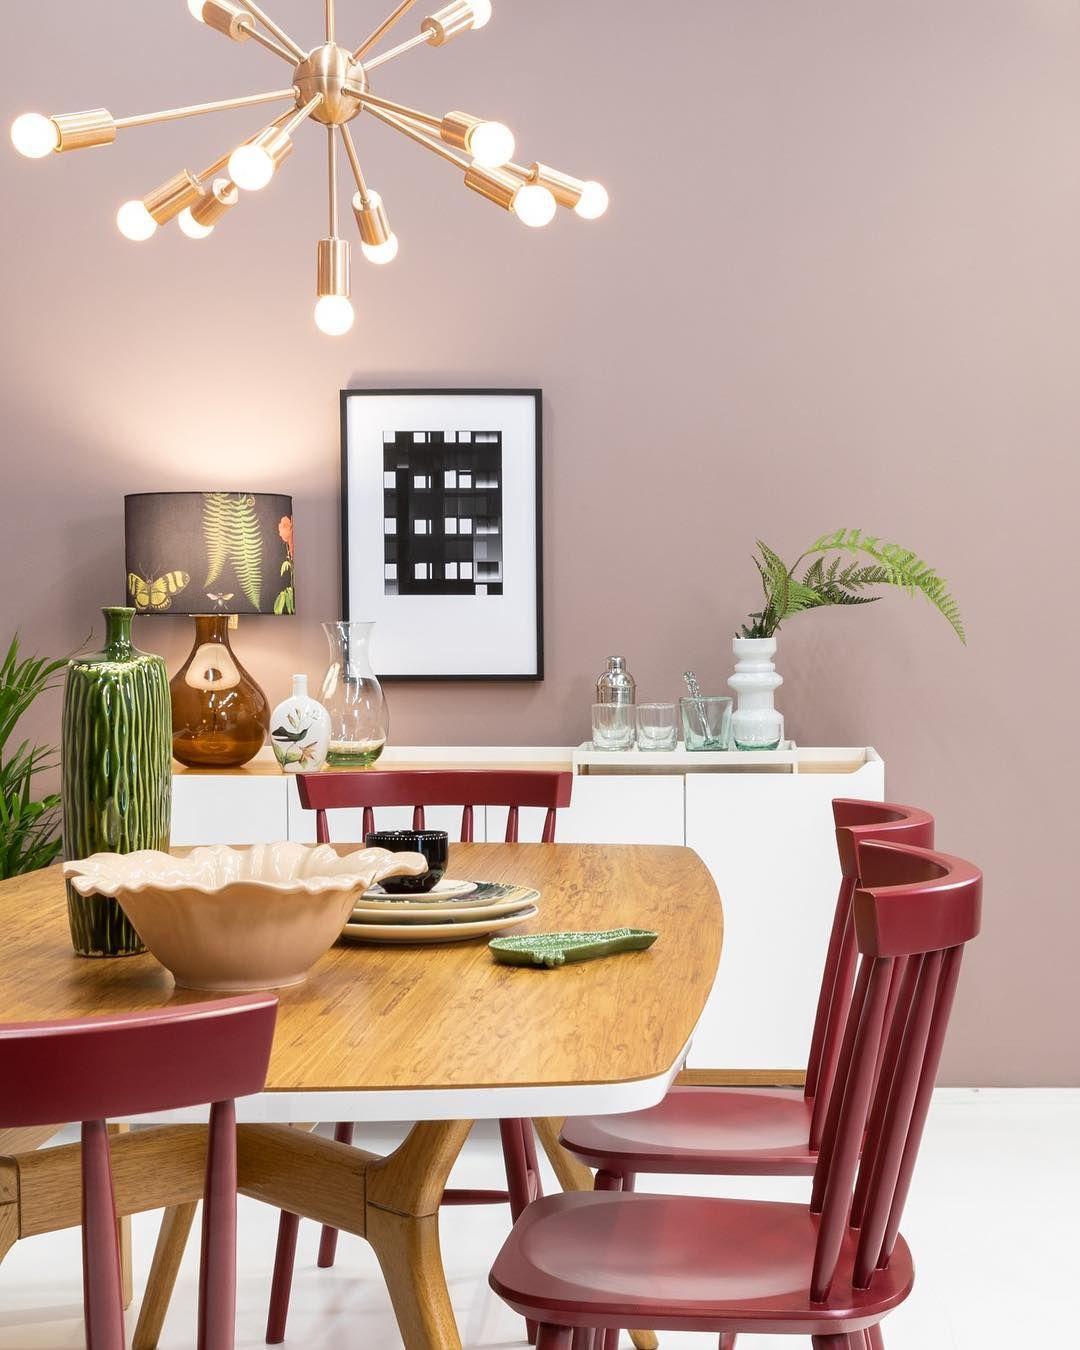 Pendentes Cadeiras Para A Mesa De Jantar Moveis Para A Cozinha